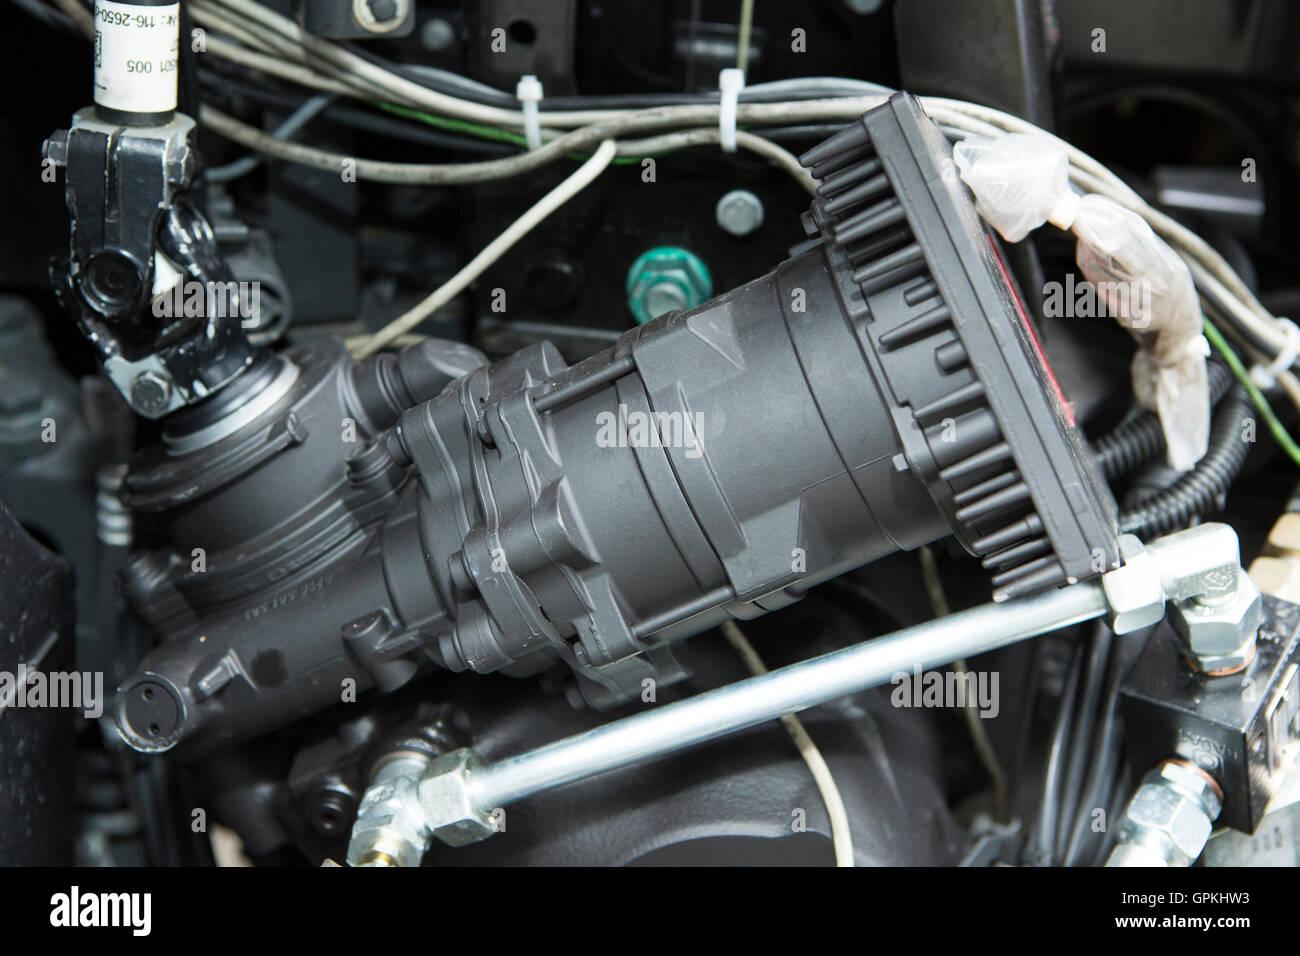 Nett Fahrzeug Motorteile Ideen - Schaltplan Serie Circuit Collection ...